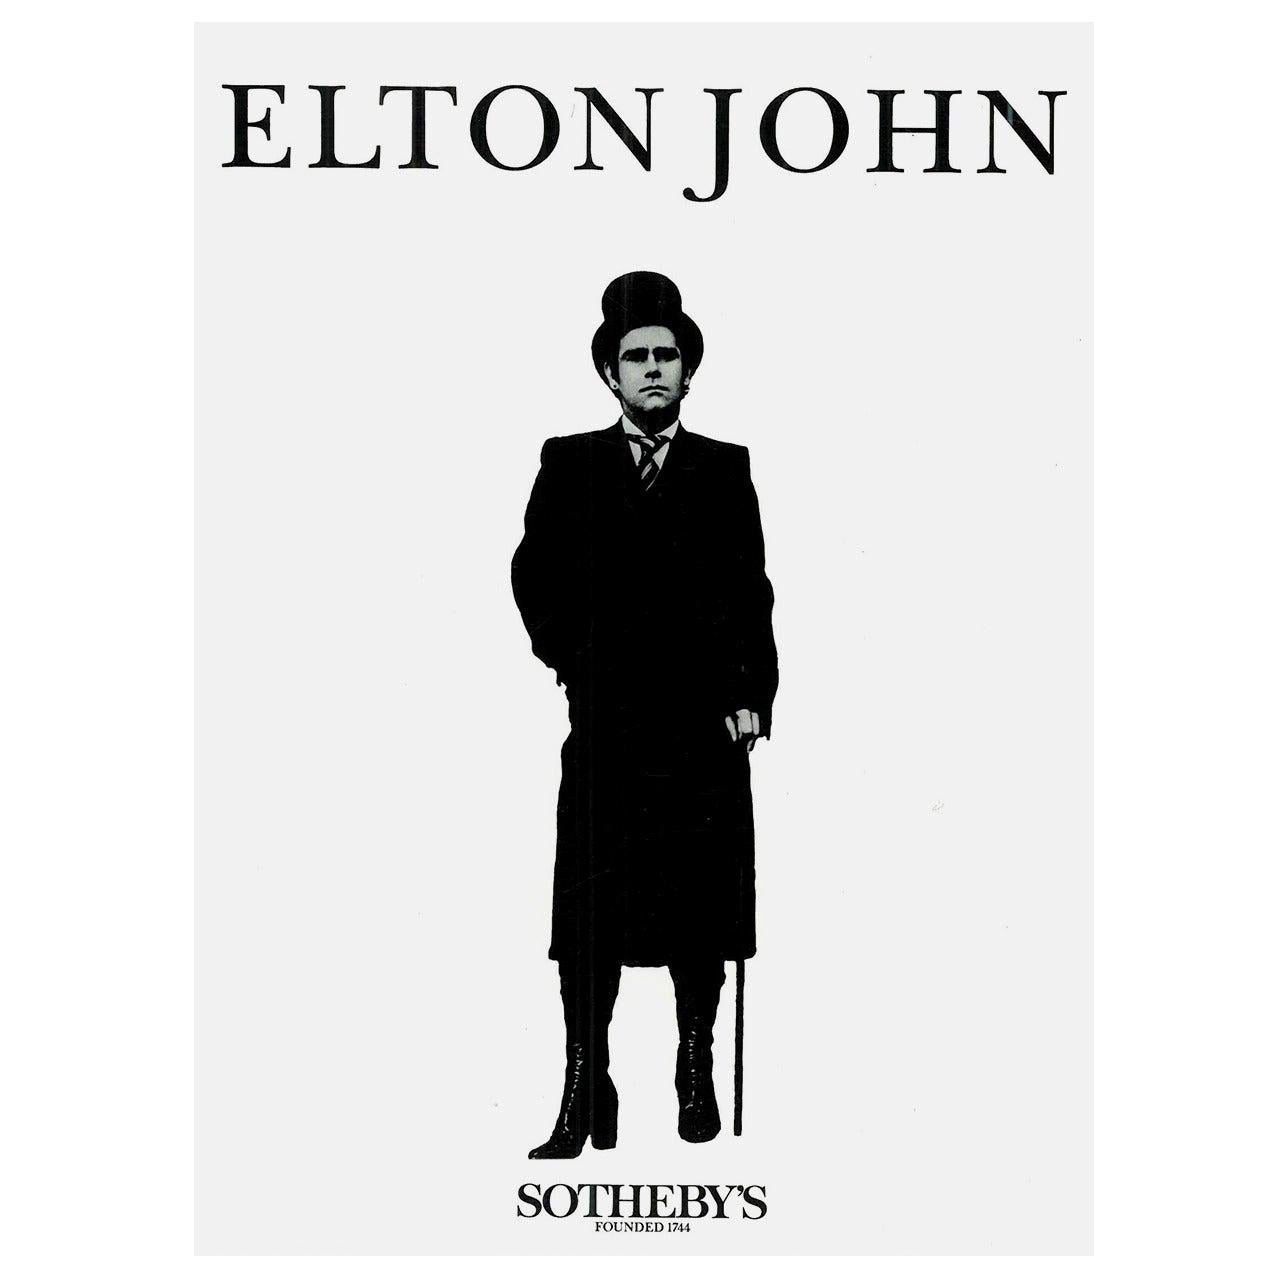 """Elton John,"" Sotheby's Sale 1988 Four-Volume Catalogue"